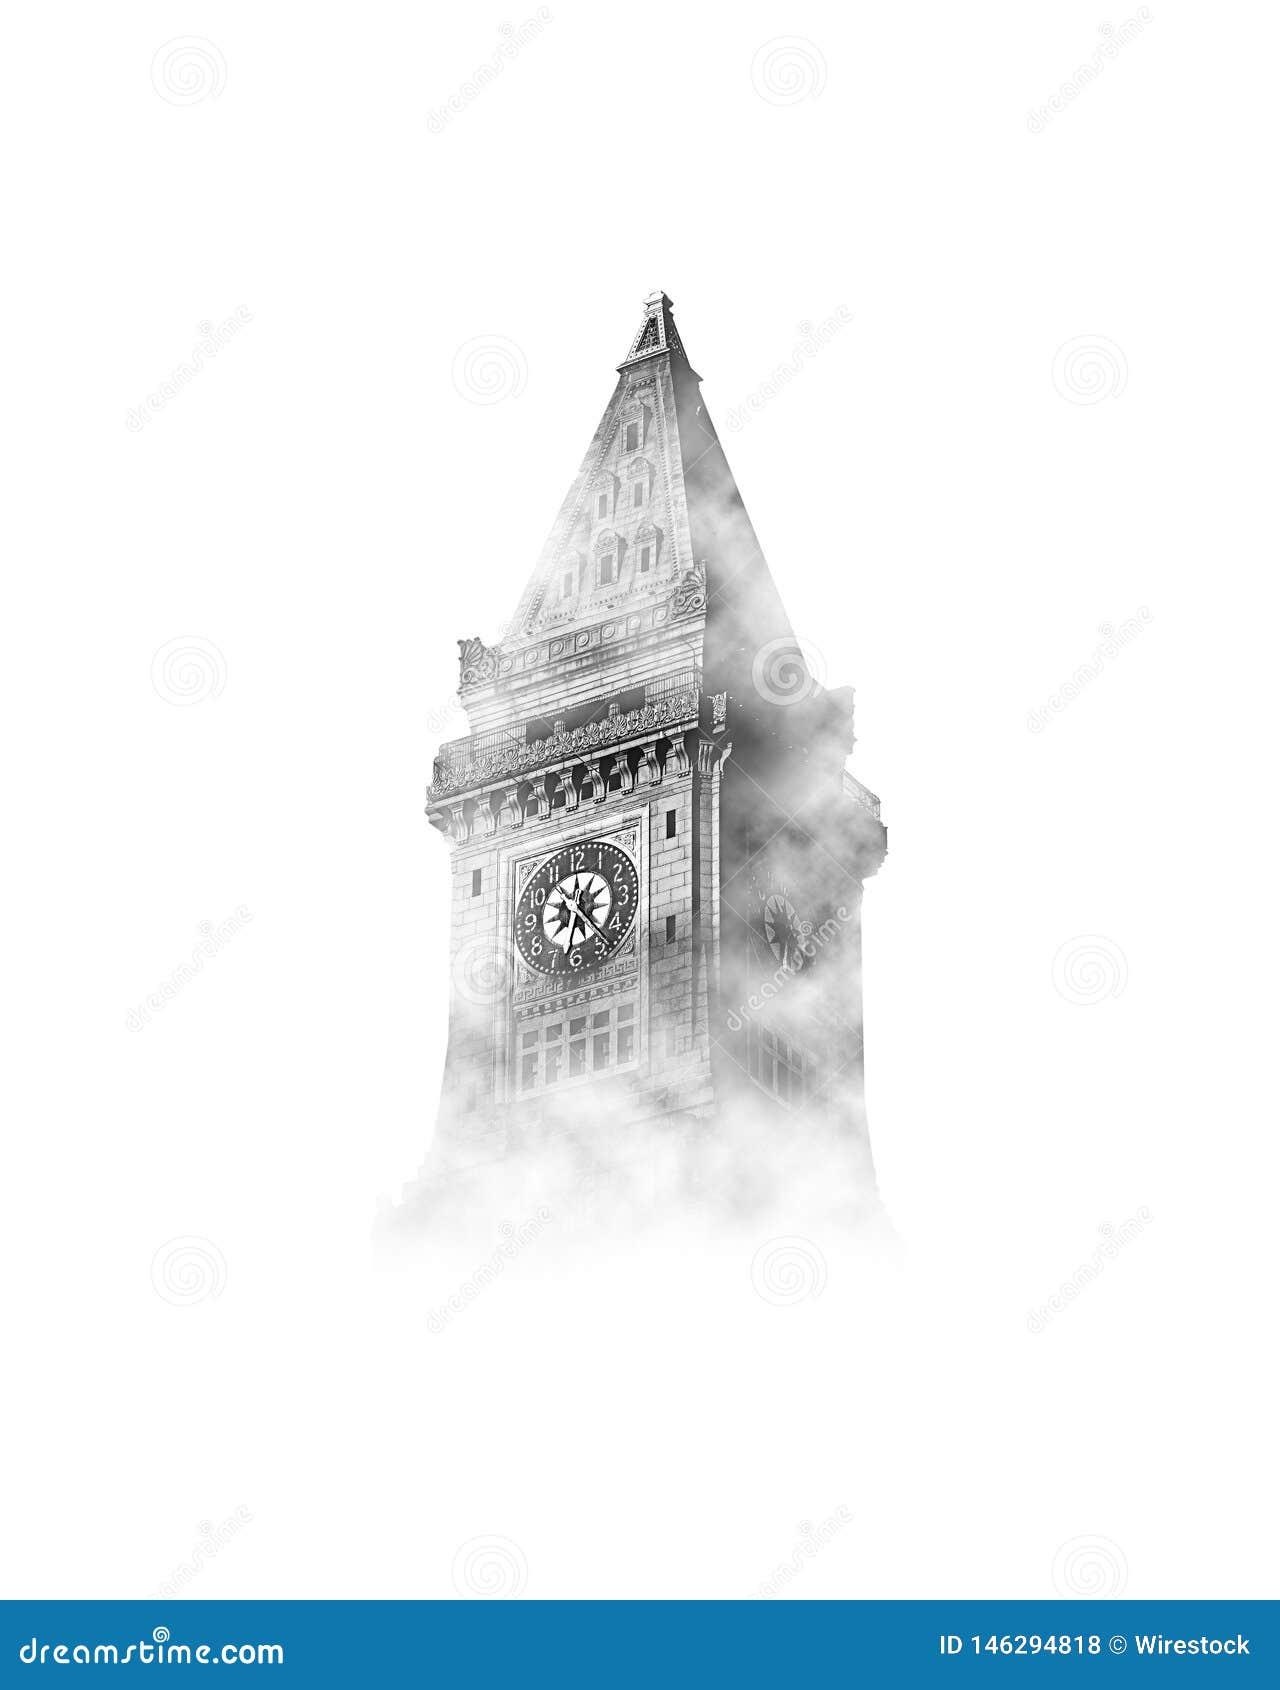 Big Ben i himlen med moln